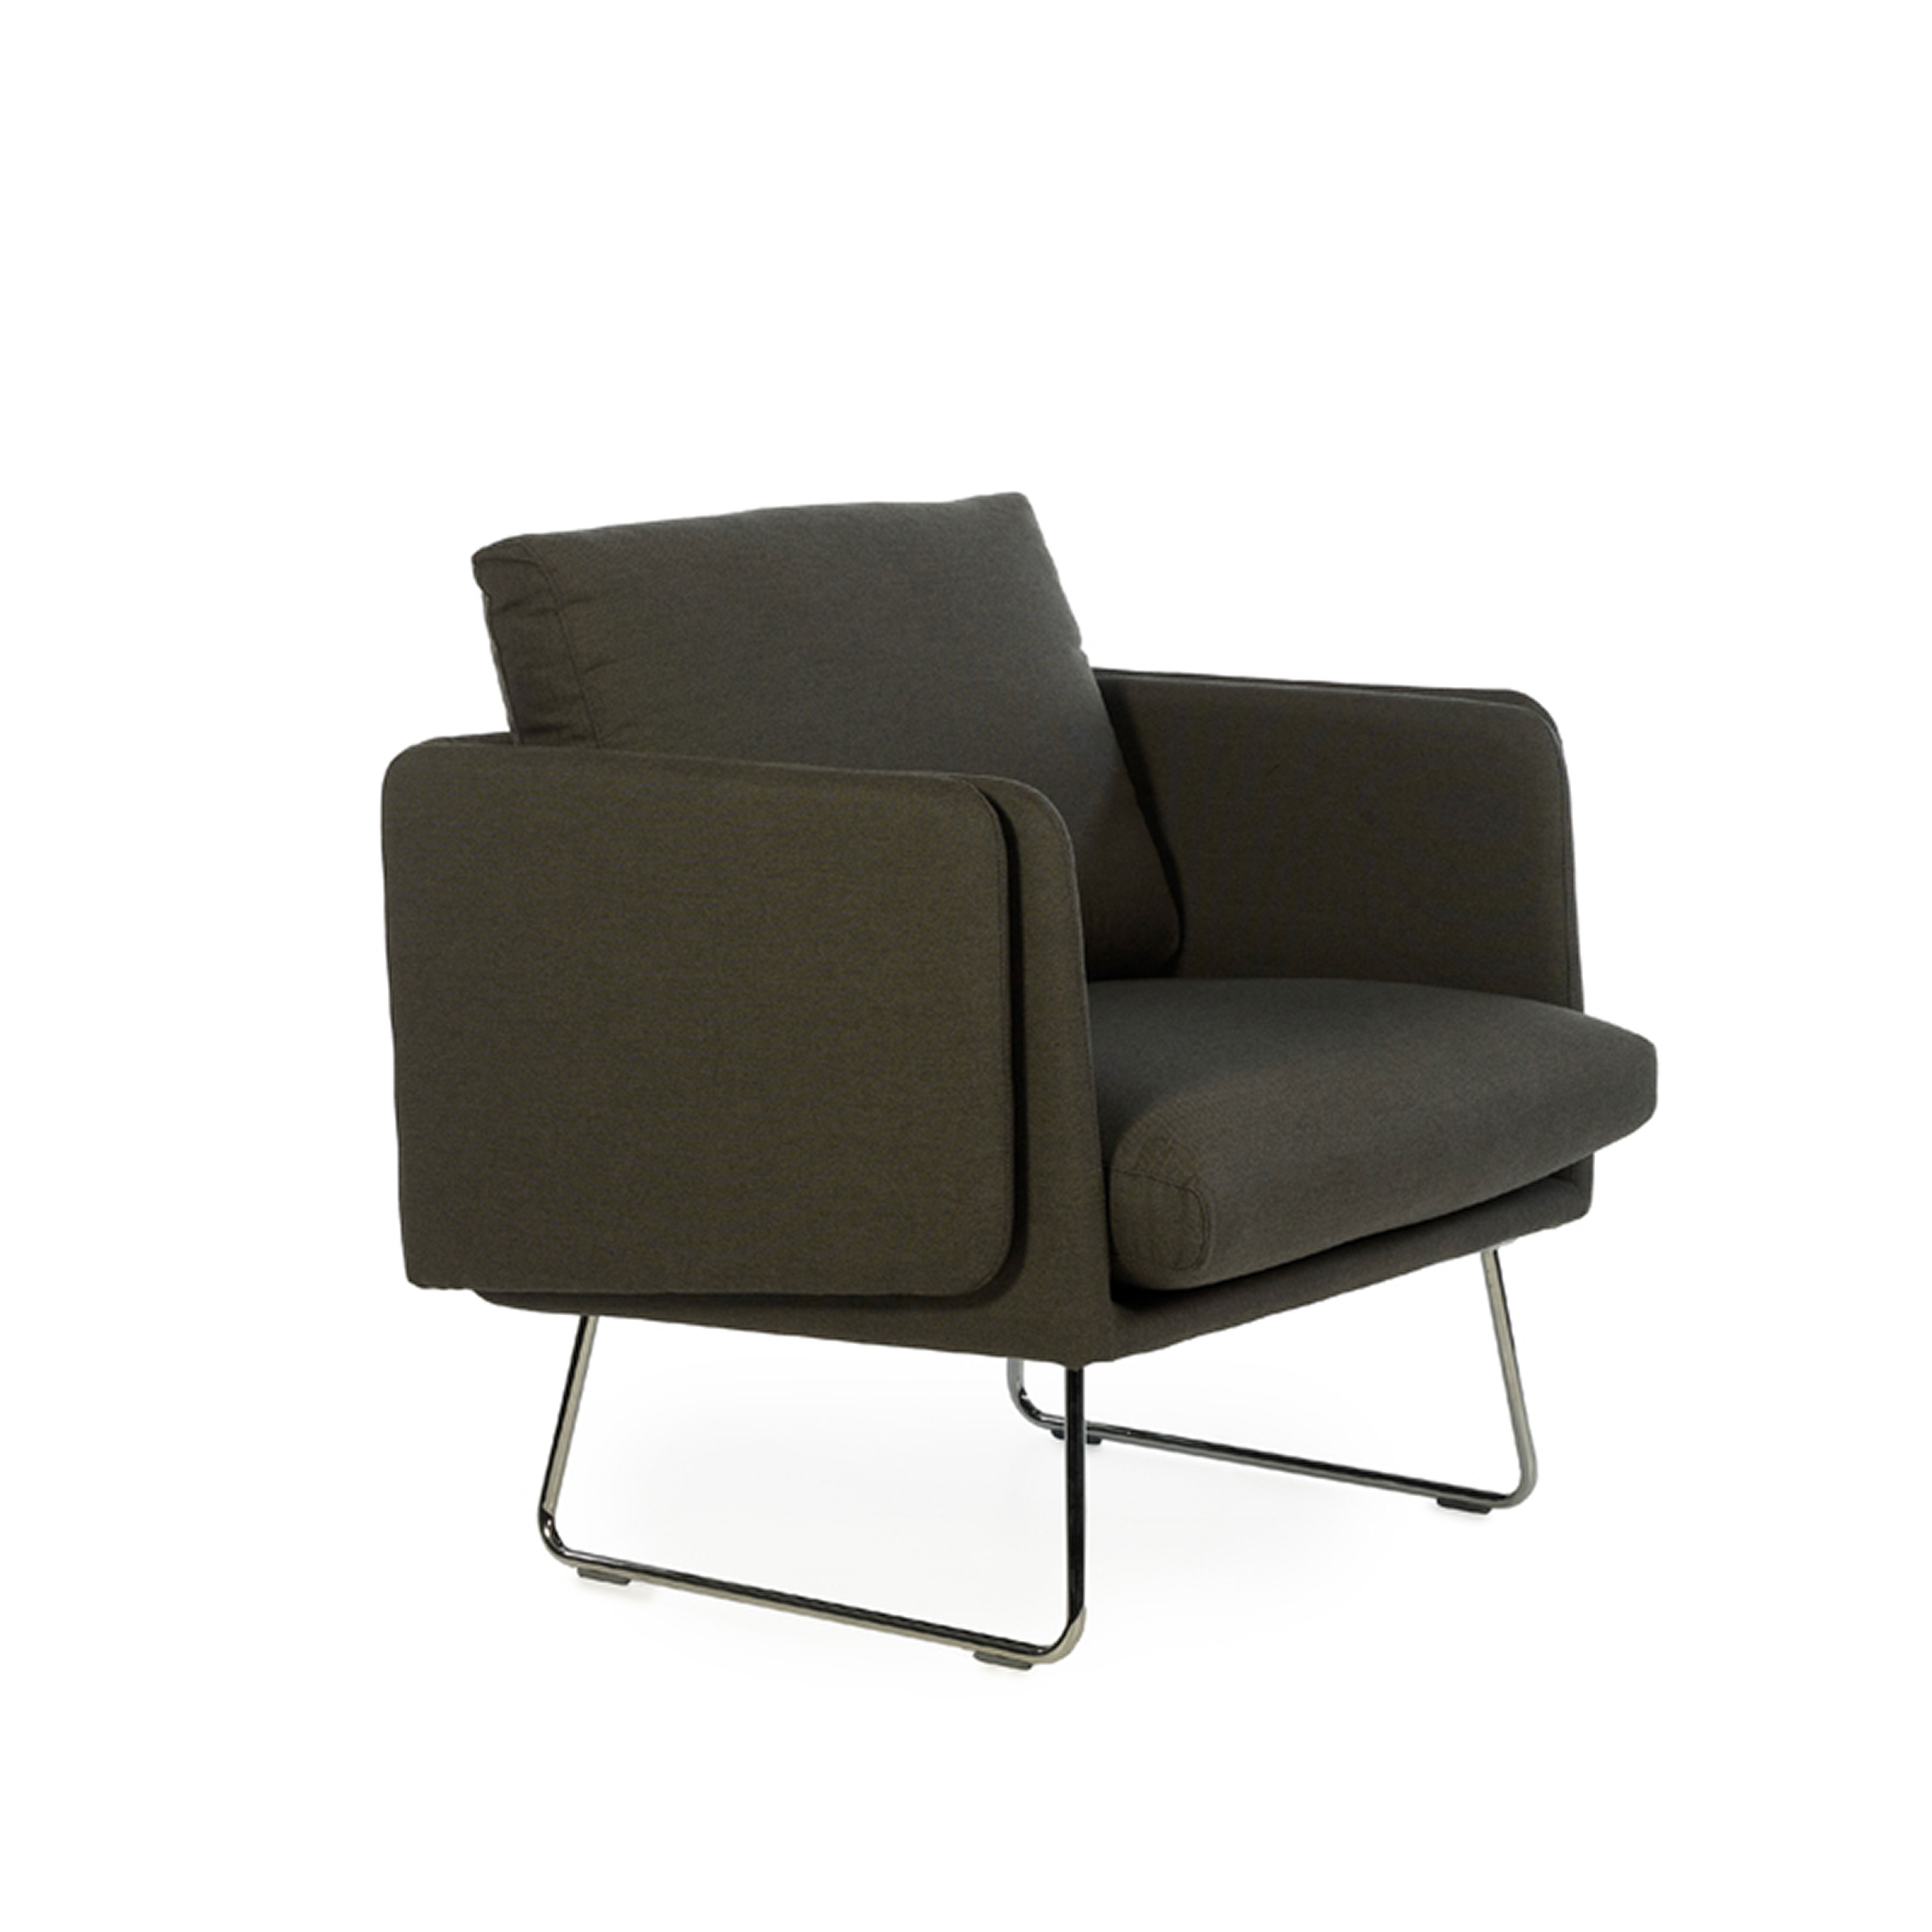 "Sessel ""Relax"" - Design SPONGY von RS Barcelona"